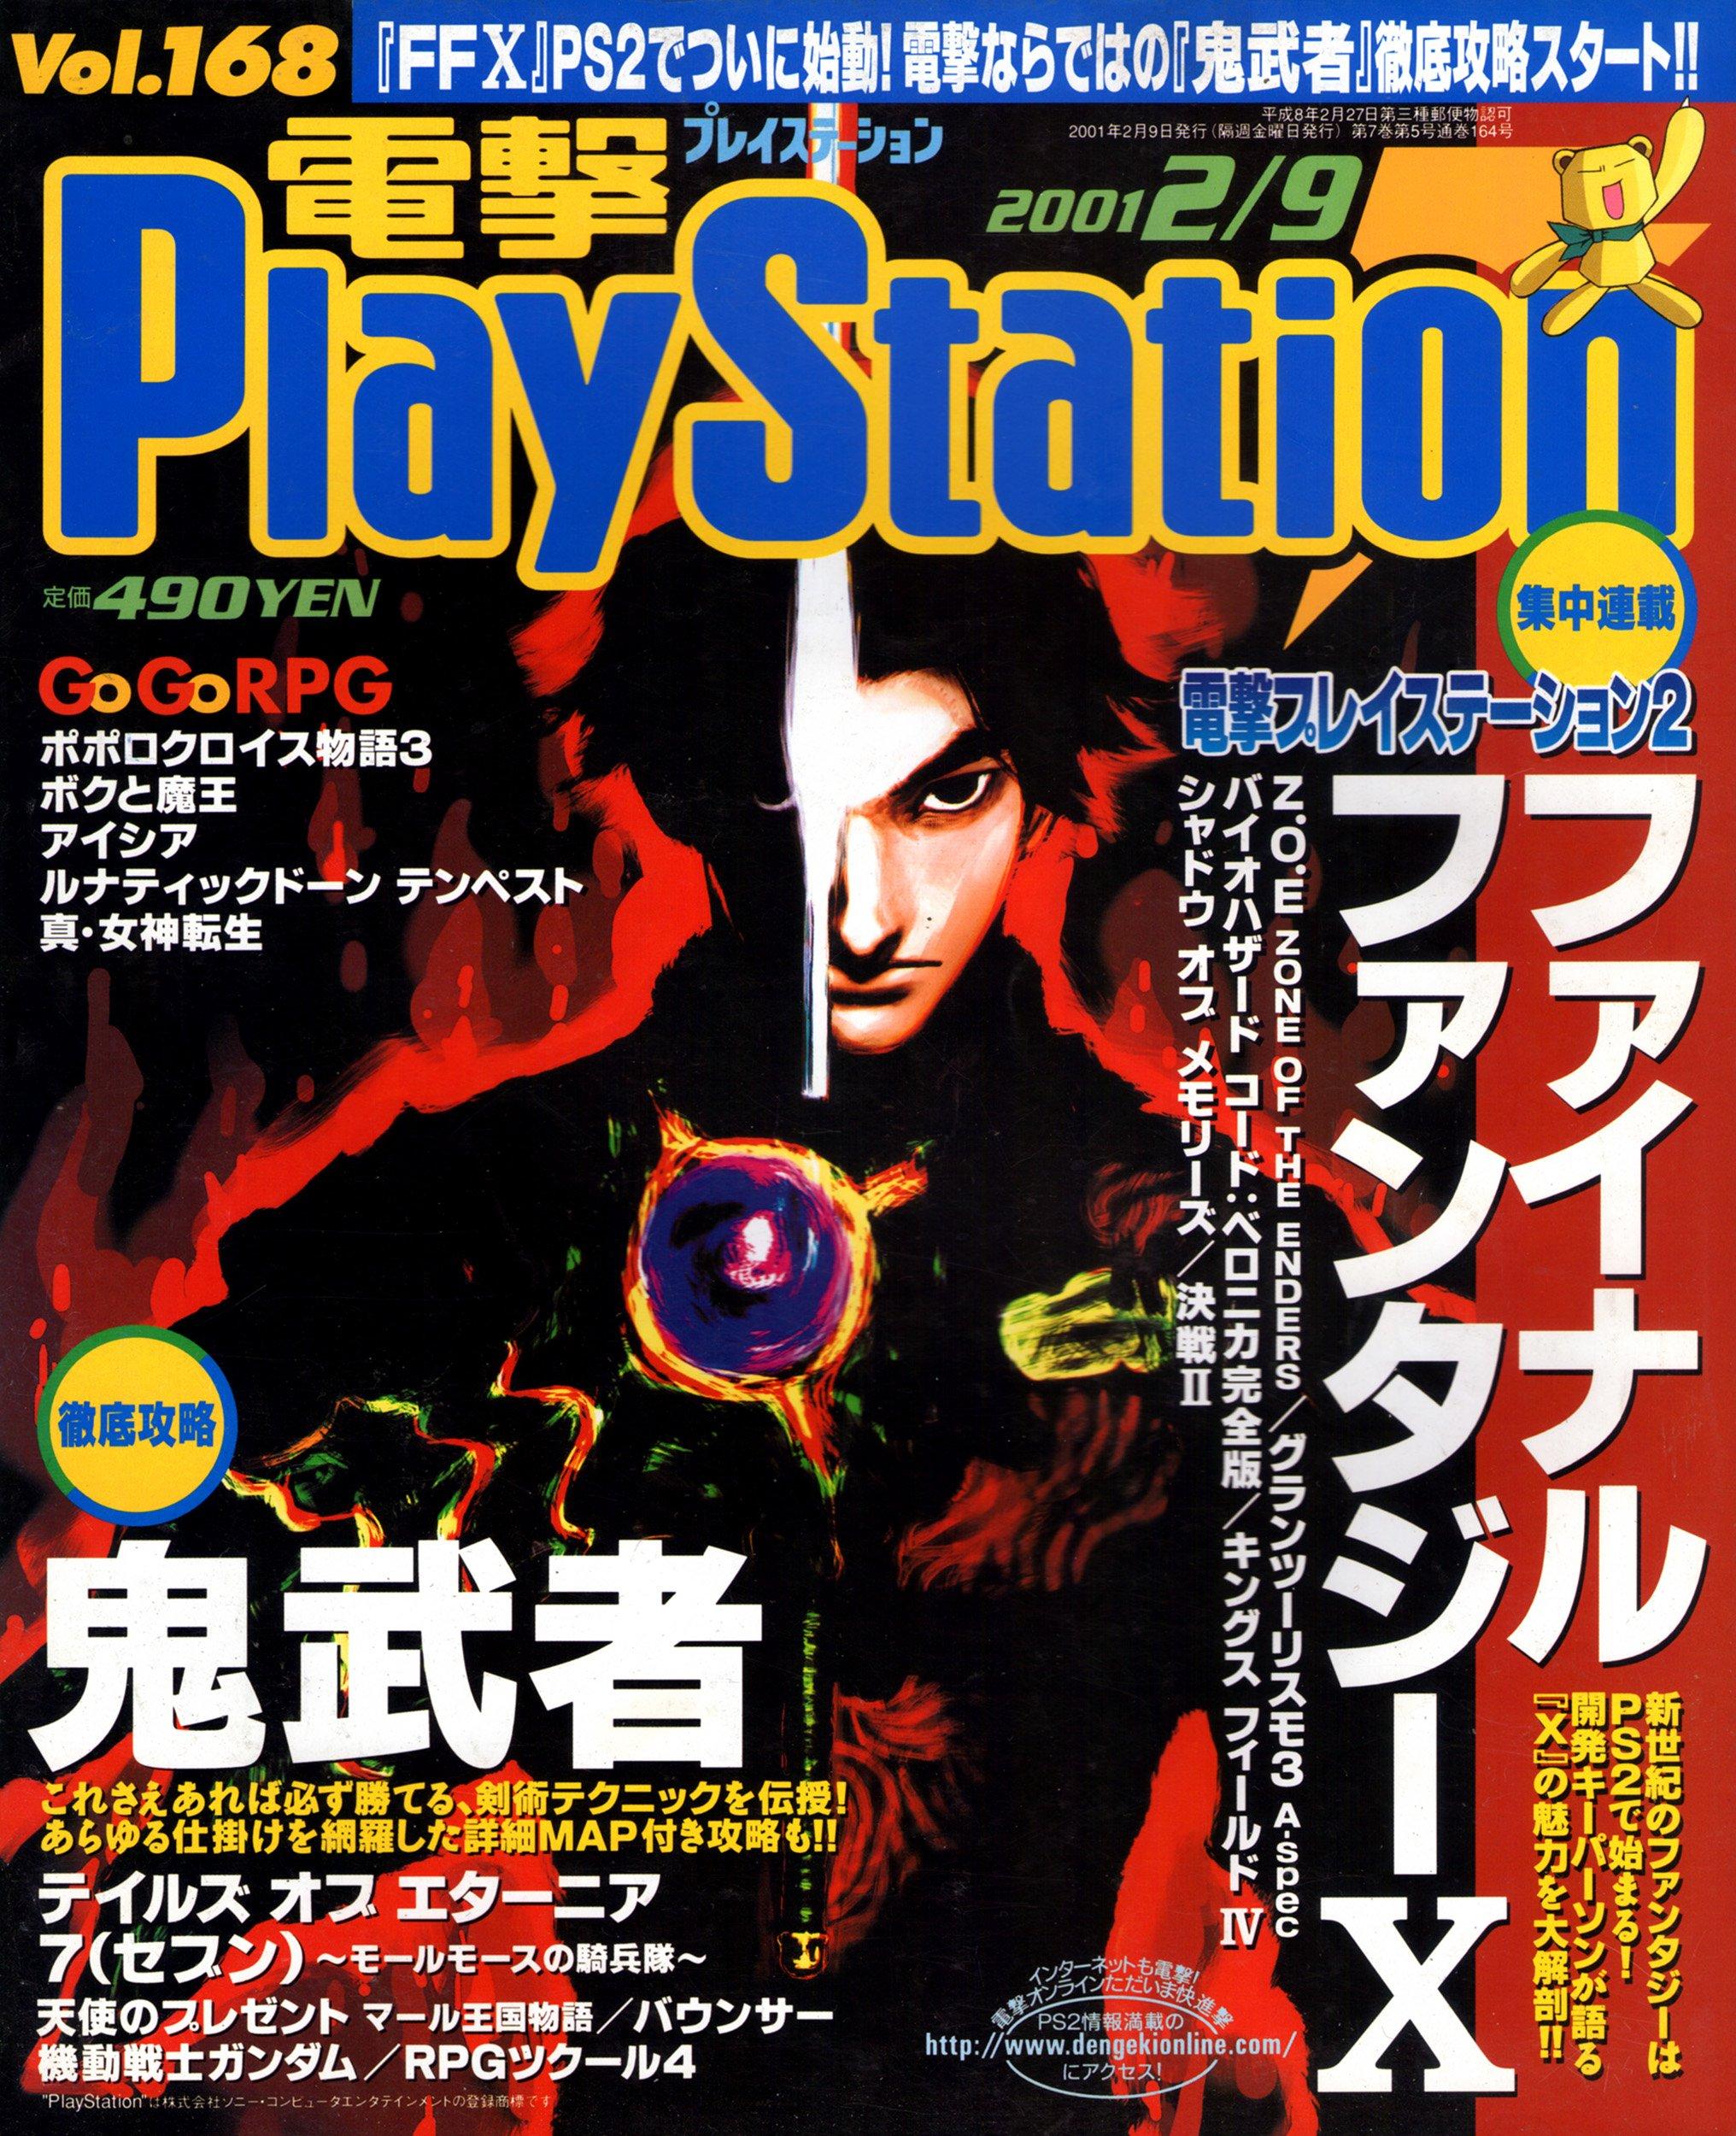 Dengeki PlayStation 168 (February 9, 2001)